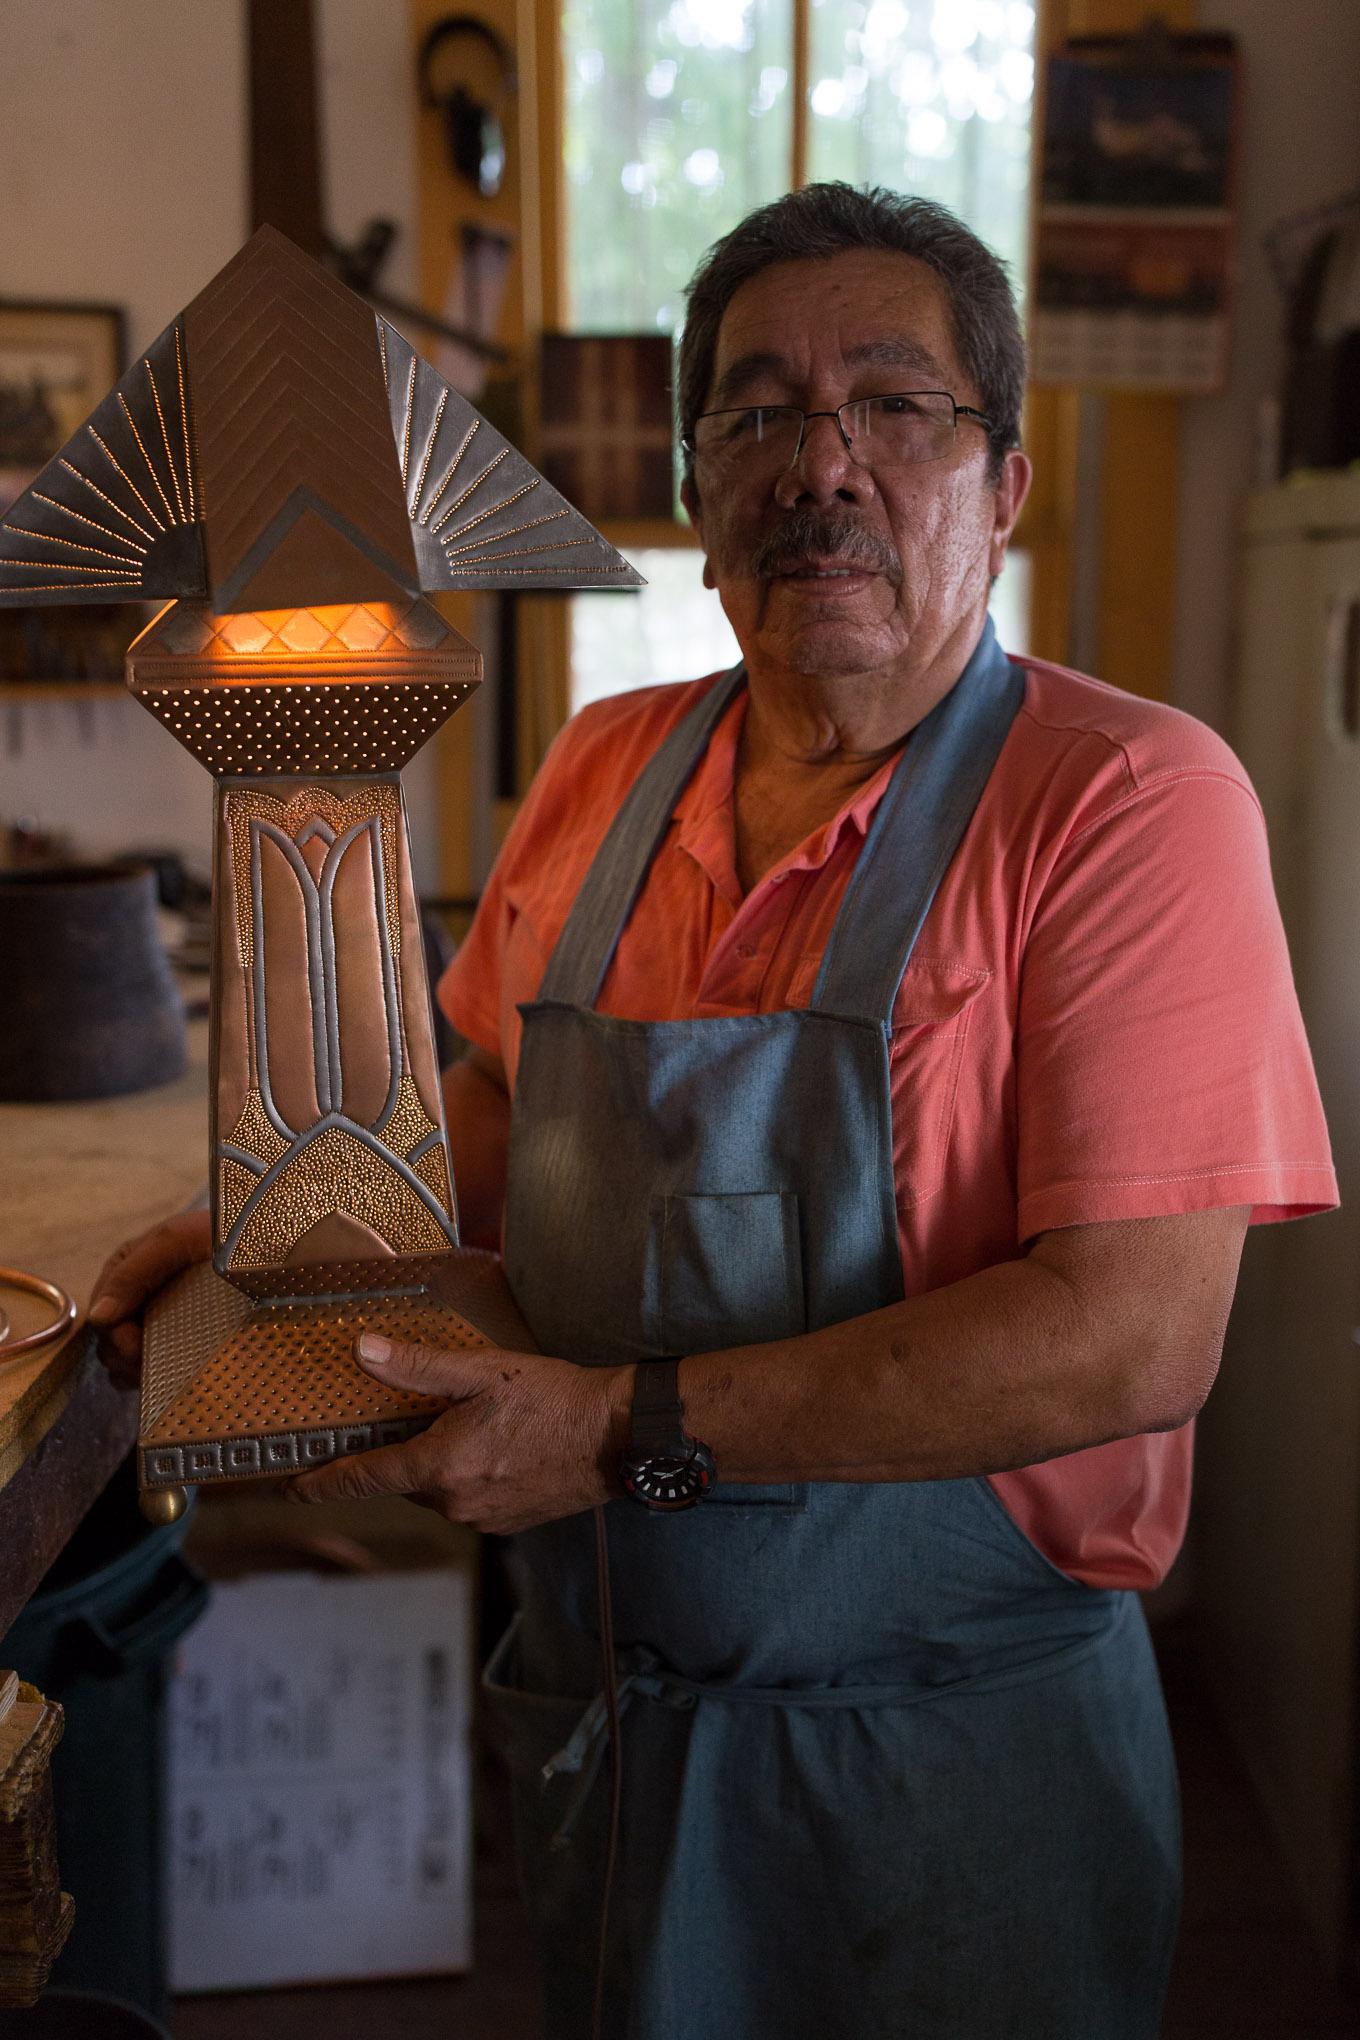 Gregorio Rebollar has been working on his craft for 40 years.